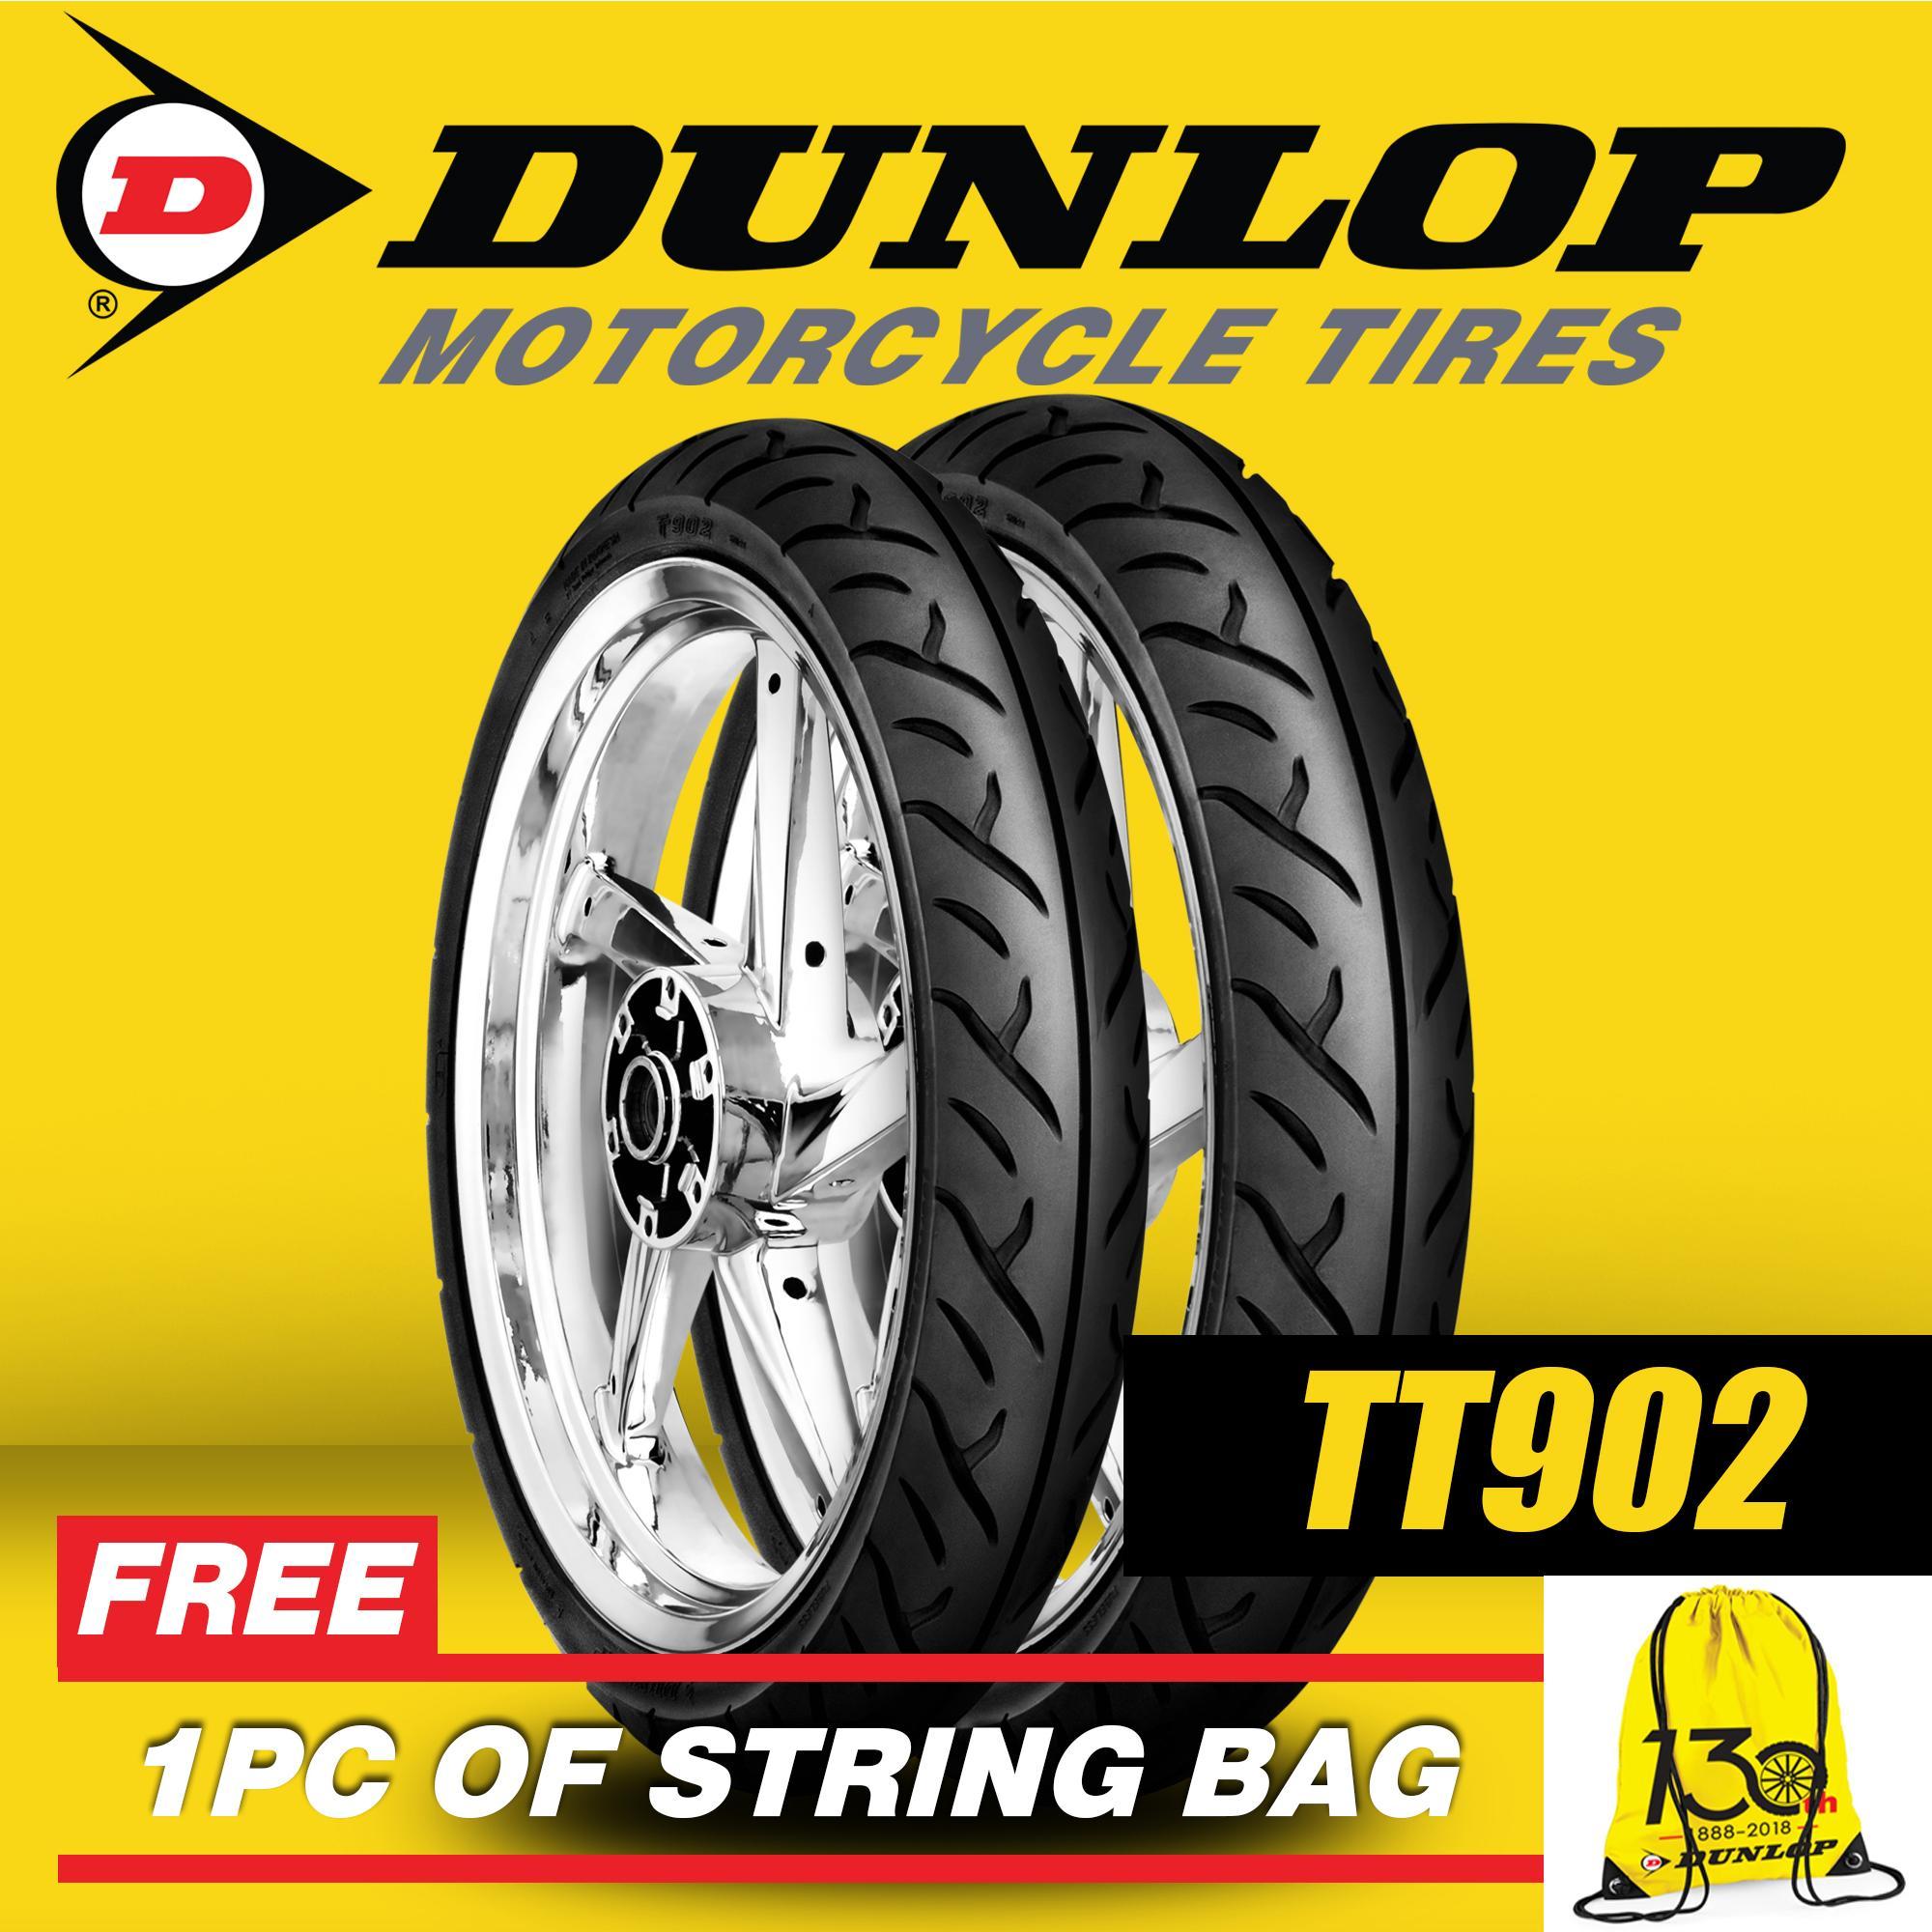 Motorcycle Tires Wheels For Sale Motorbike Online Zeneos Zn 75 70 80 17 Ban Motor Tubeless Dunlop 90 17m 38p 44p Tt902 Tubetype